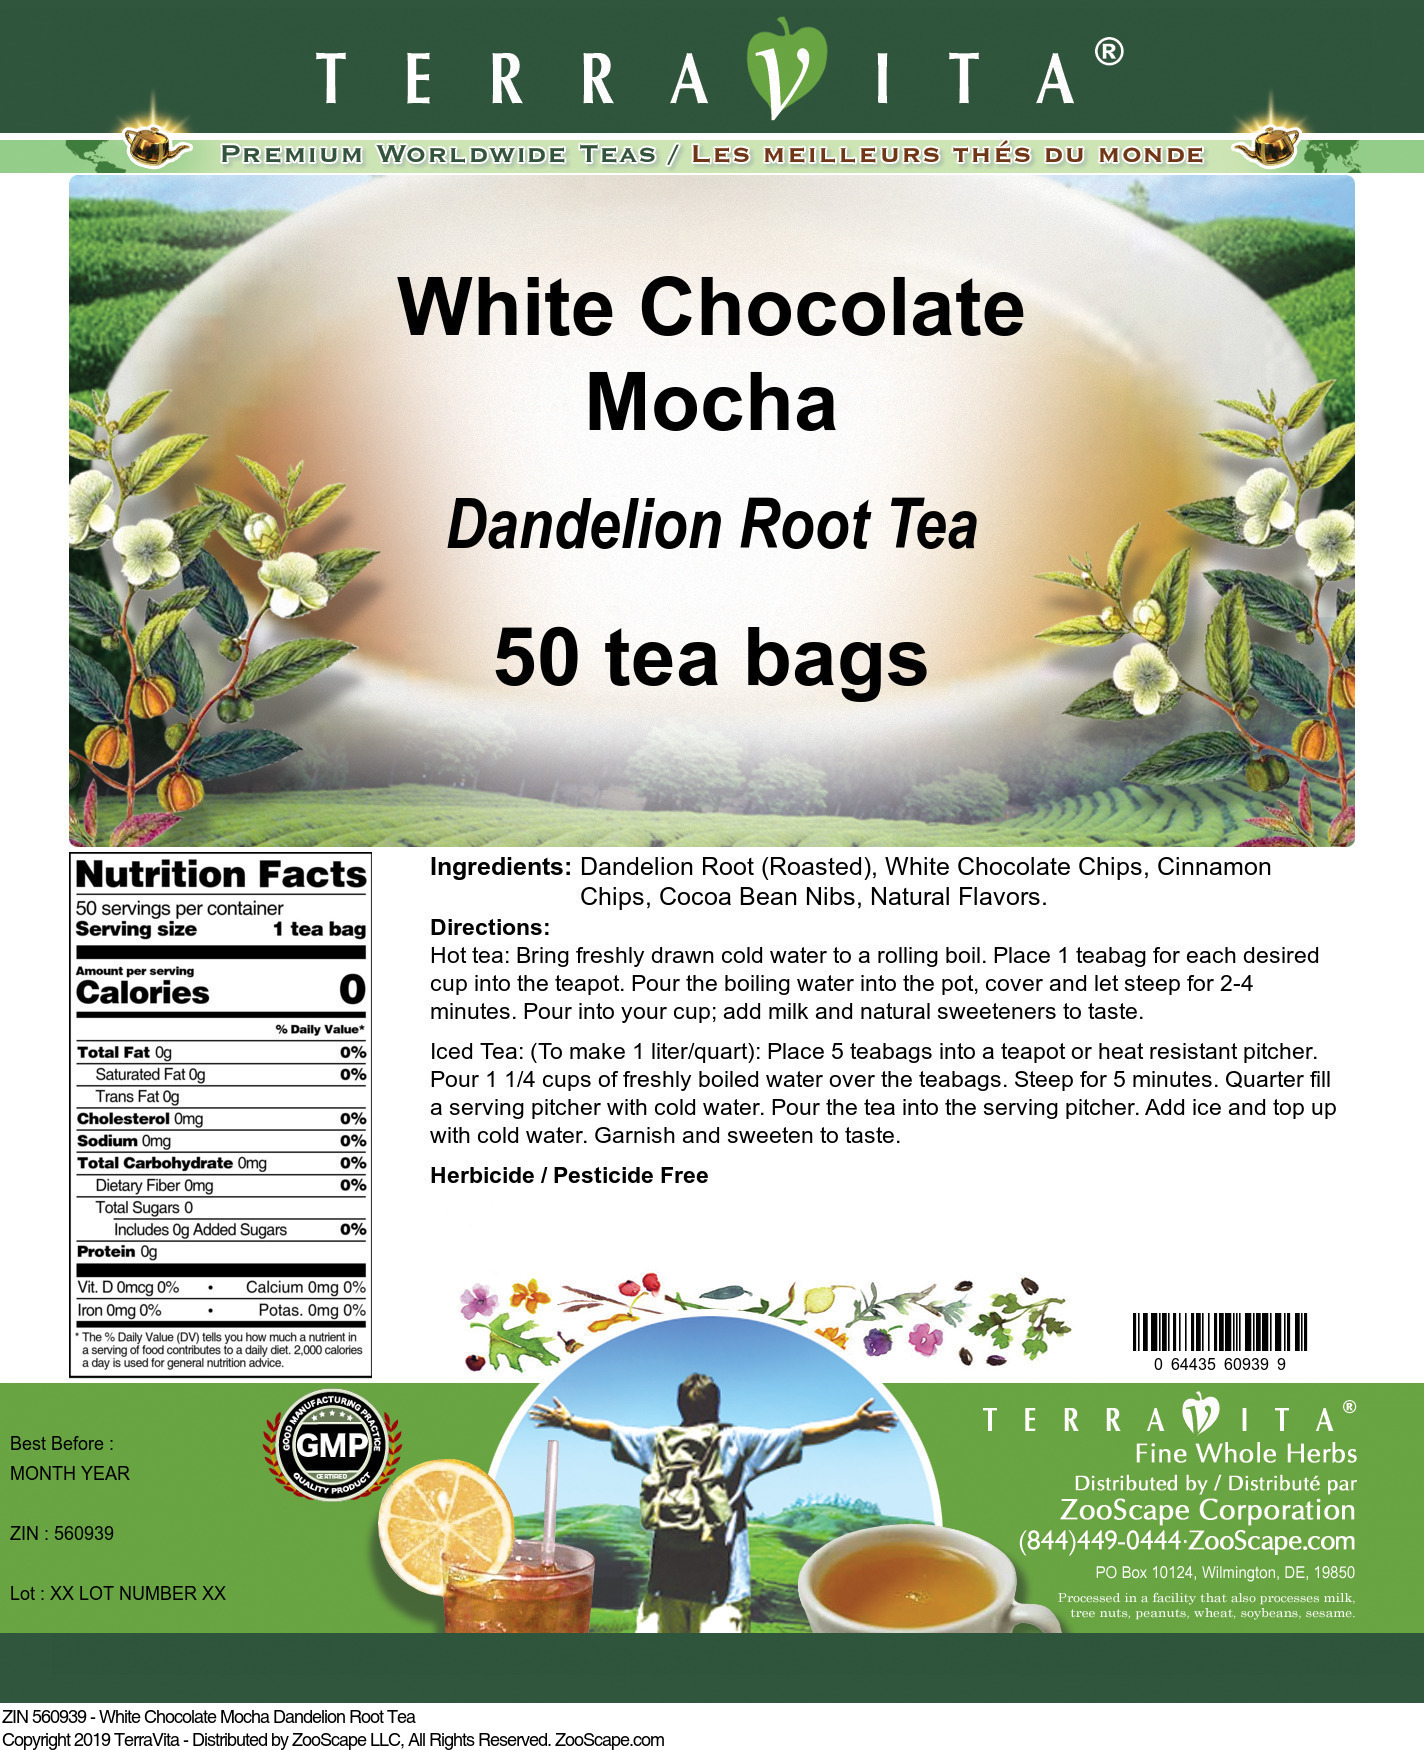 White Chocolate Mocha Dandelion Root